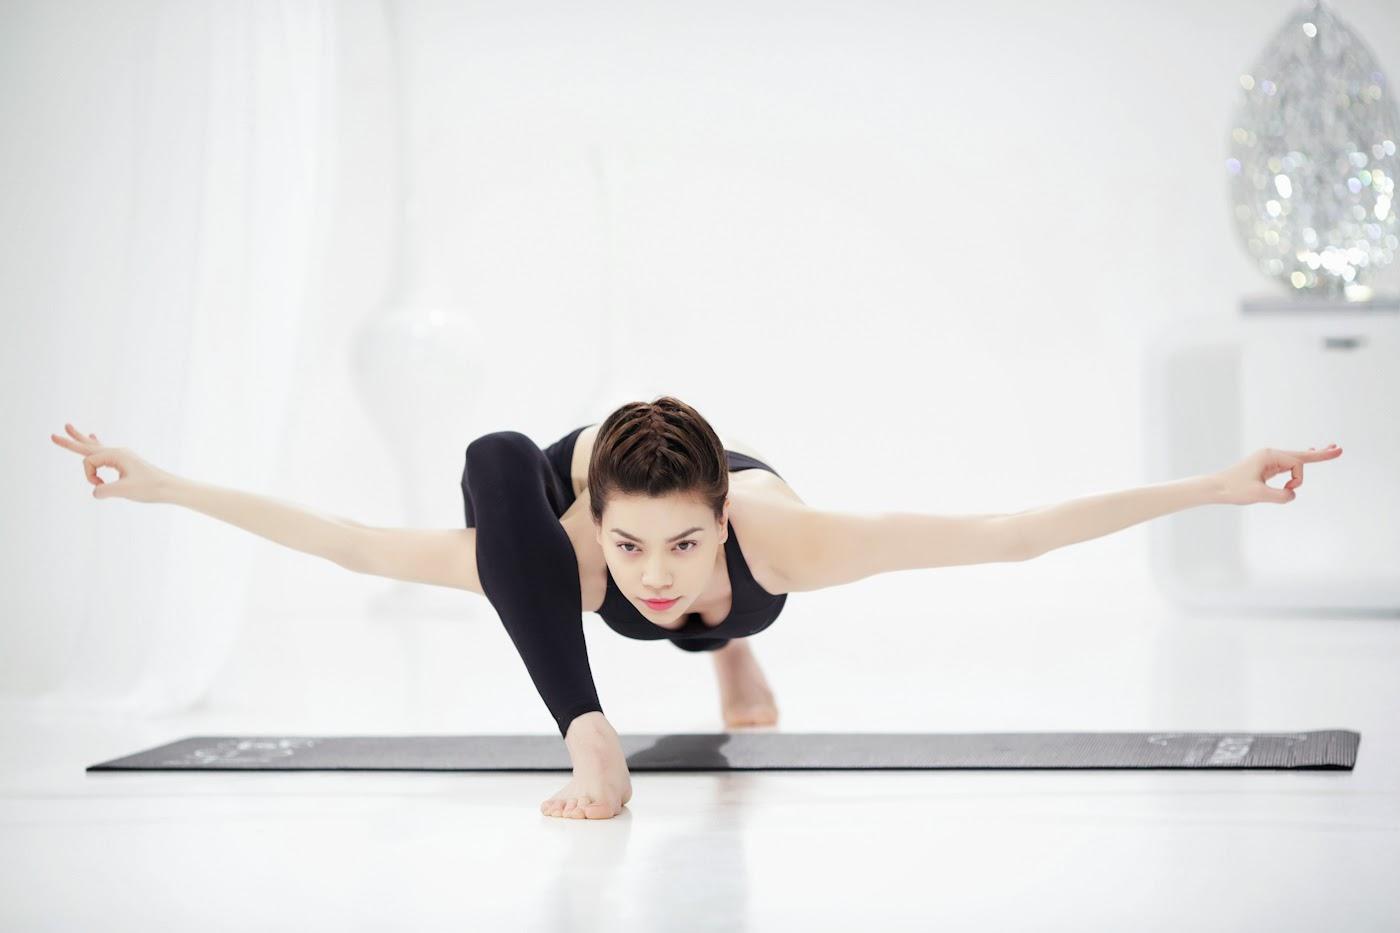 ho helped bring yoga - 1023×682